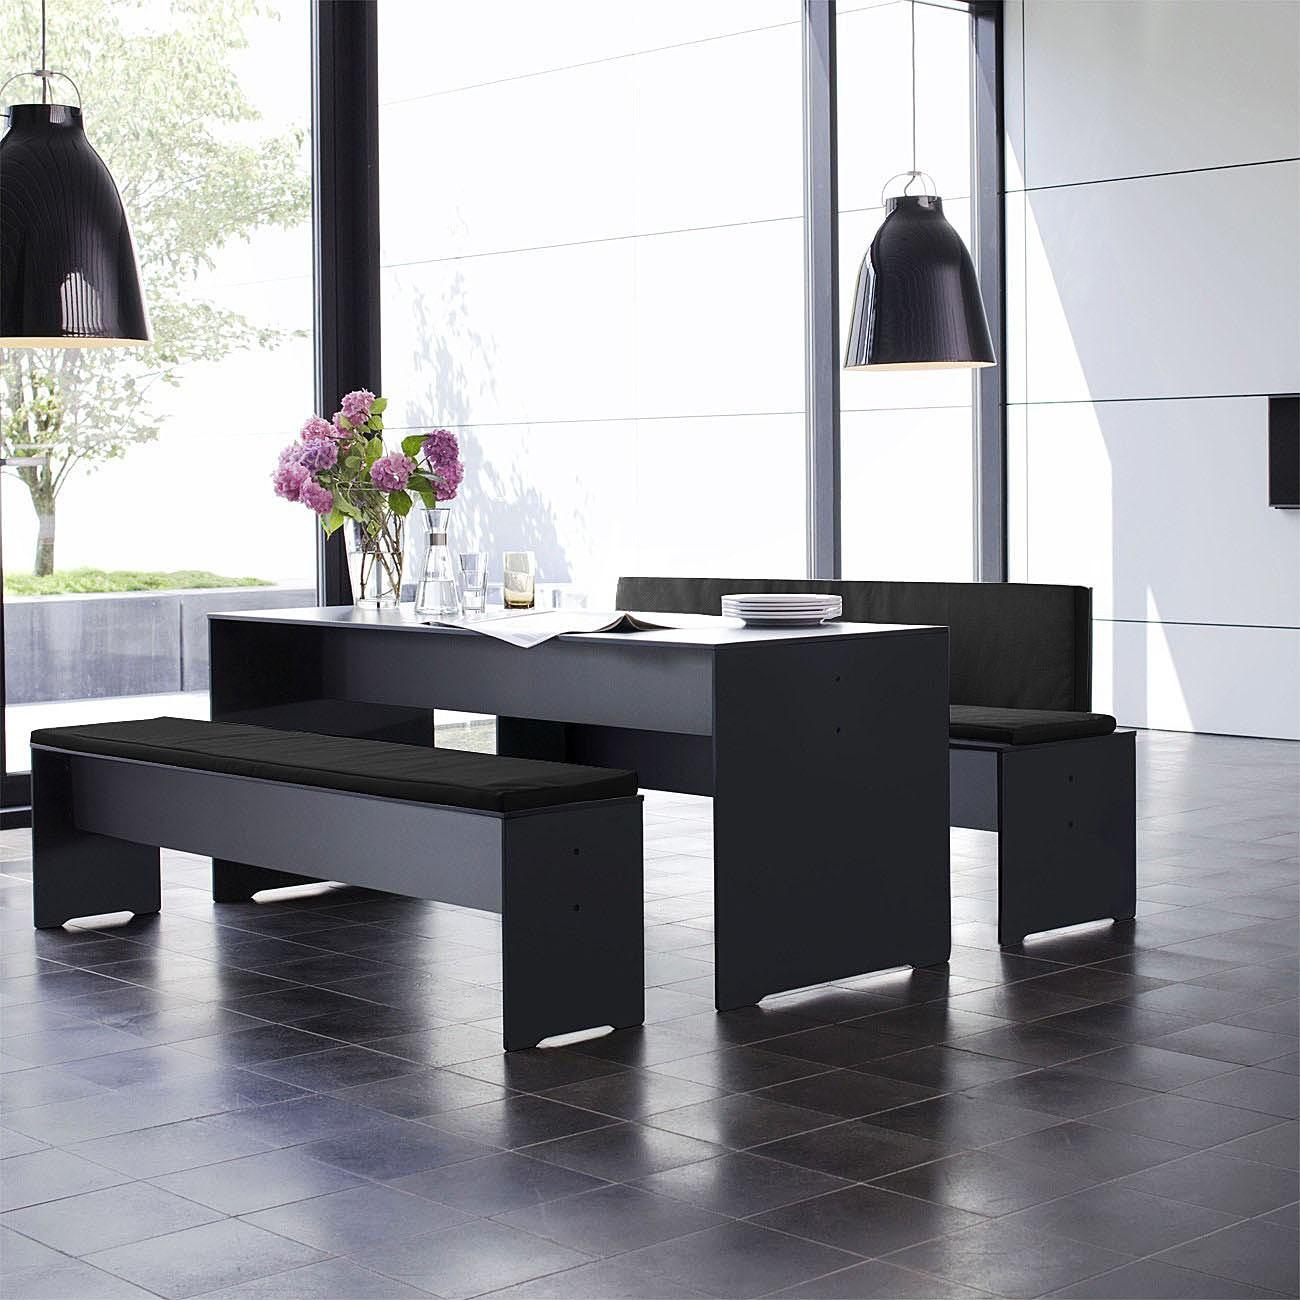 conmoto riva bank m 194 anthrazit ohne auflage wetterfest aus hpl gartenbank eingang. Black Bedroom Furniture Sets. Home Design Ideas